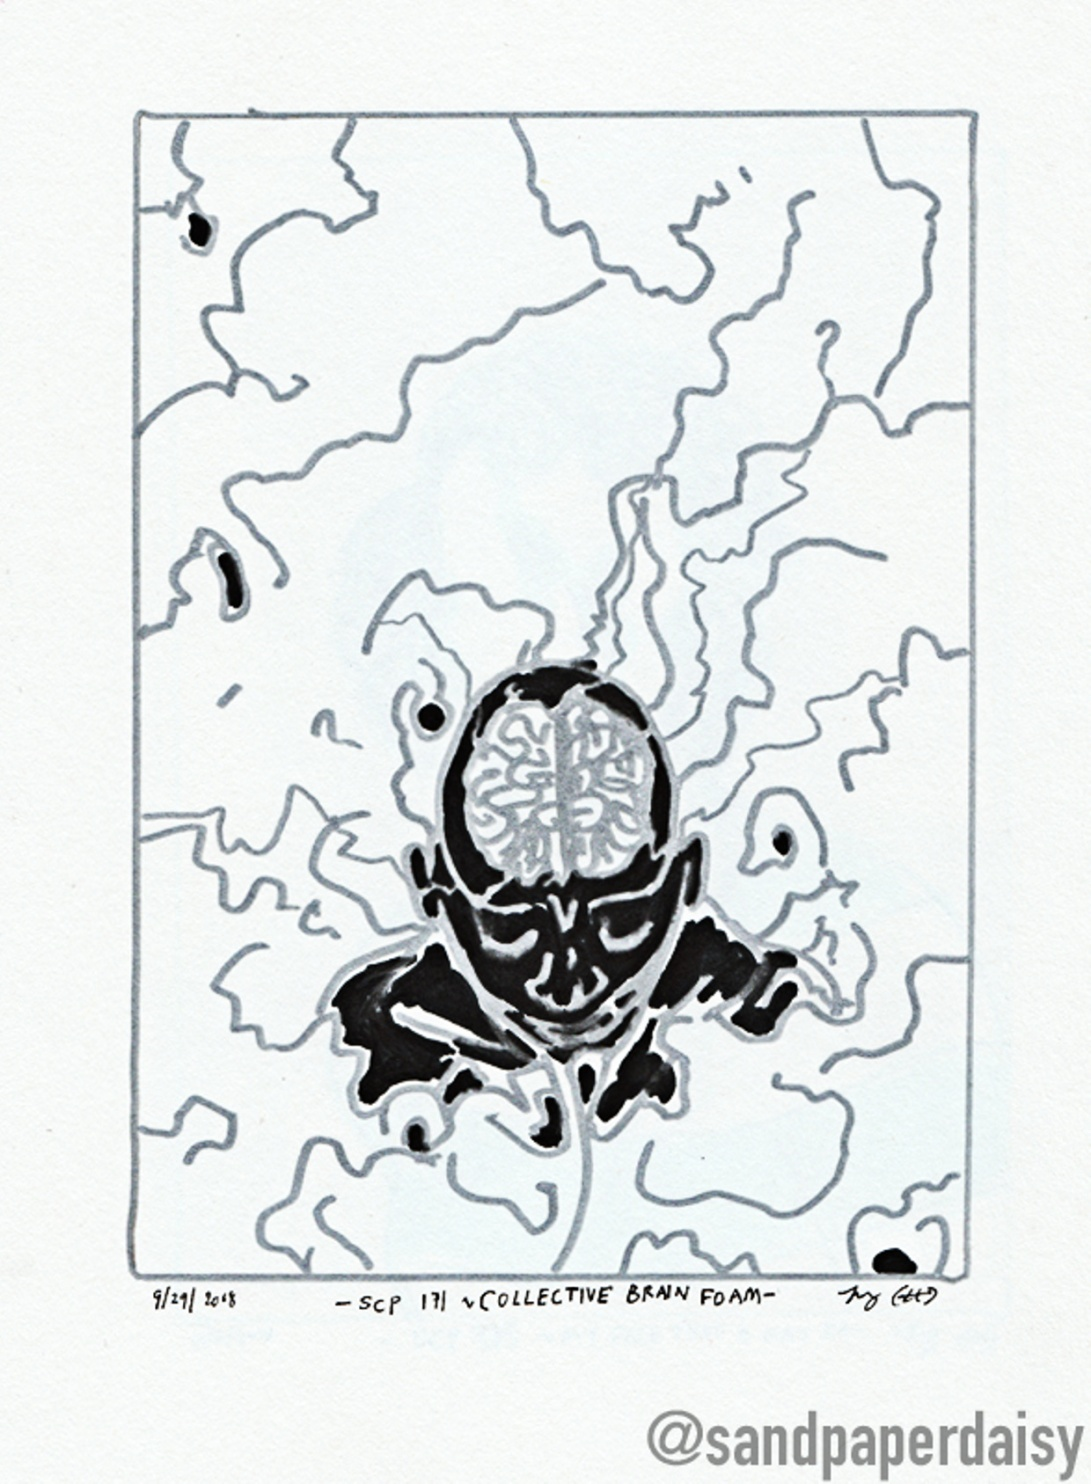 inktober07_SCP171-Collective-Brain-Foam_sandpaperdaisy